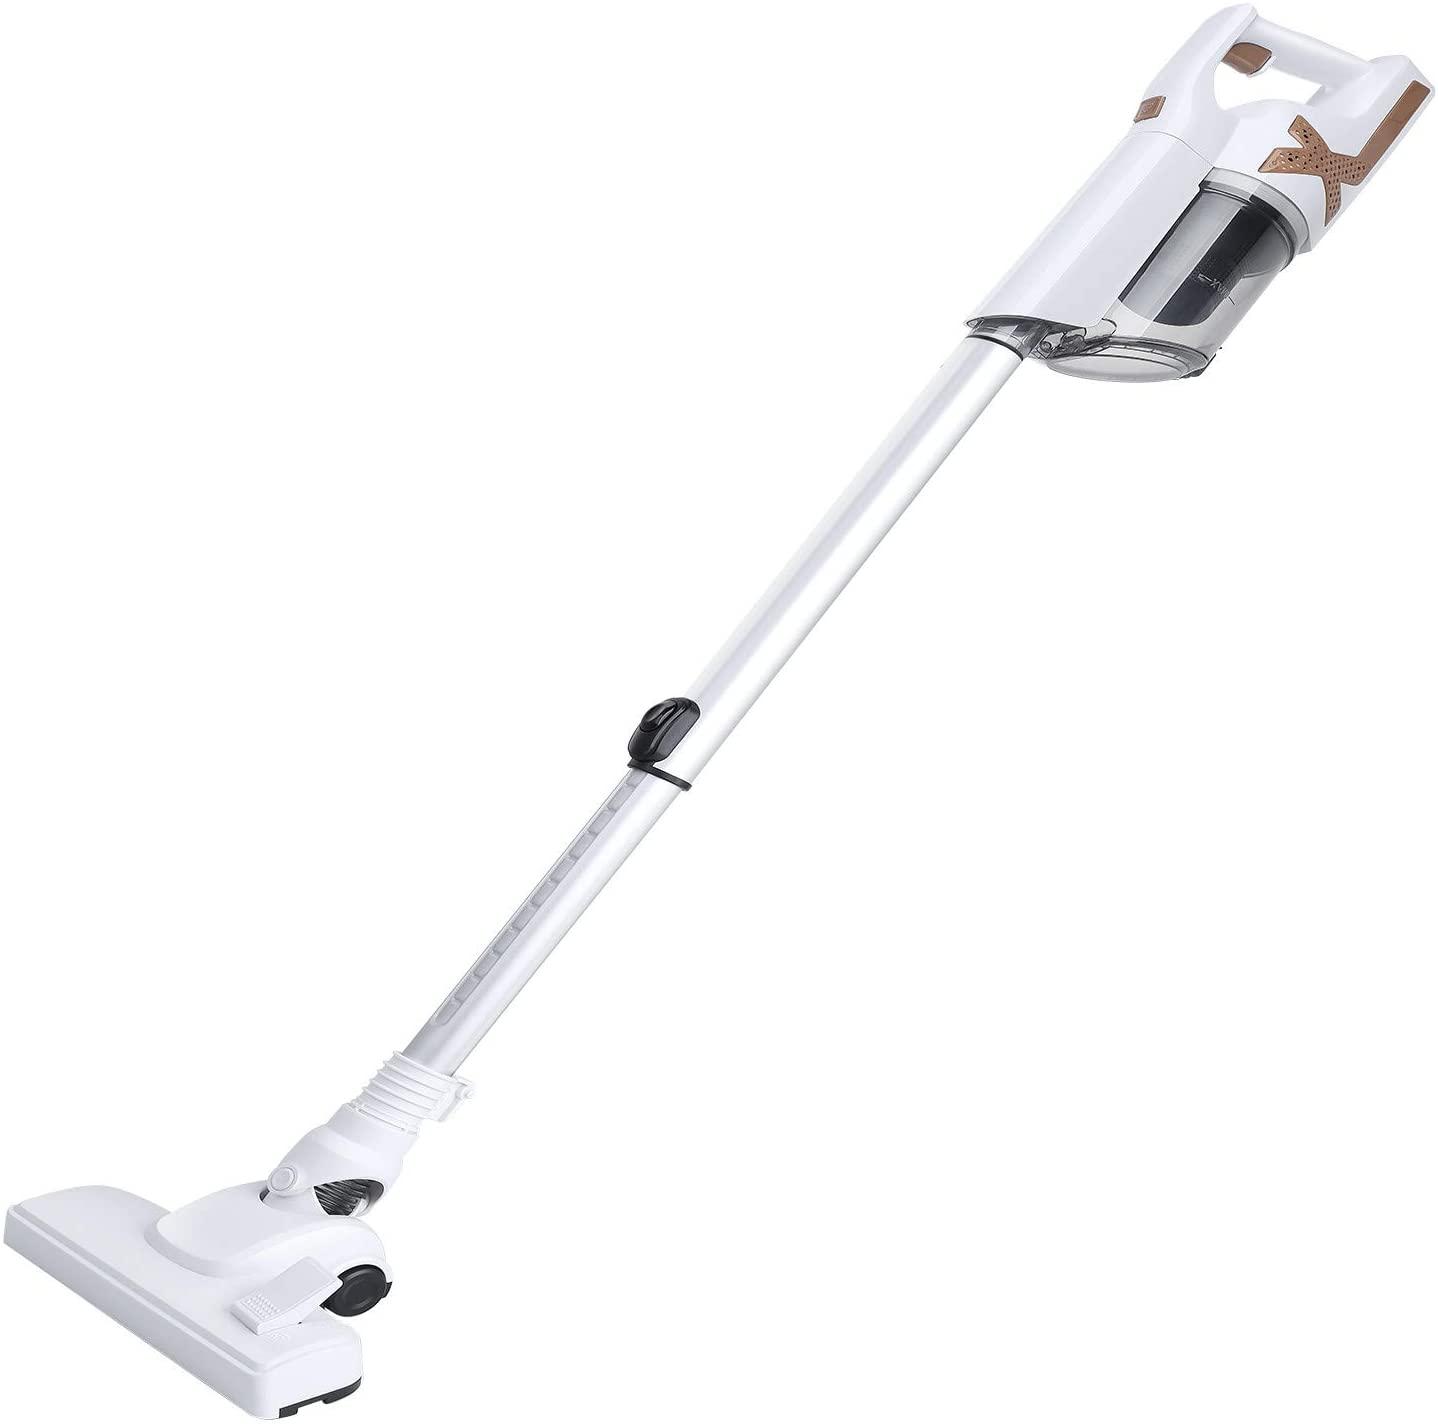 GBSELL Hand-Held Vacuum Ultra Light Cordless Cleaner, Multifunctional Household Vacuum Cleaner Mute Vacuum Cleaner, for Carpets & Hard Floors